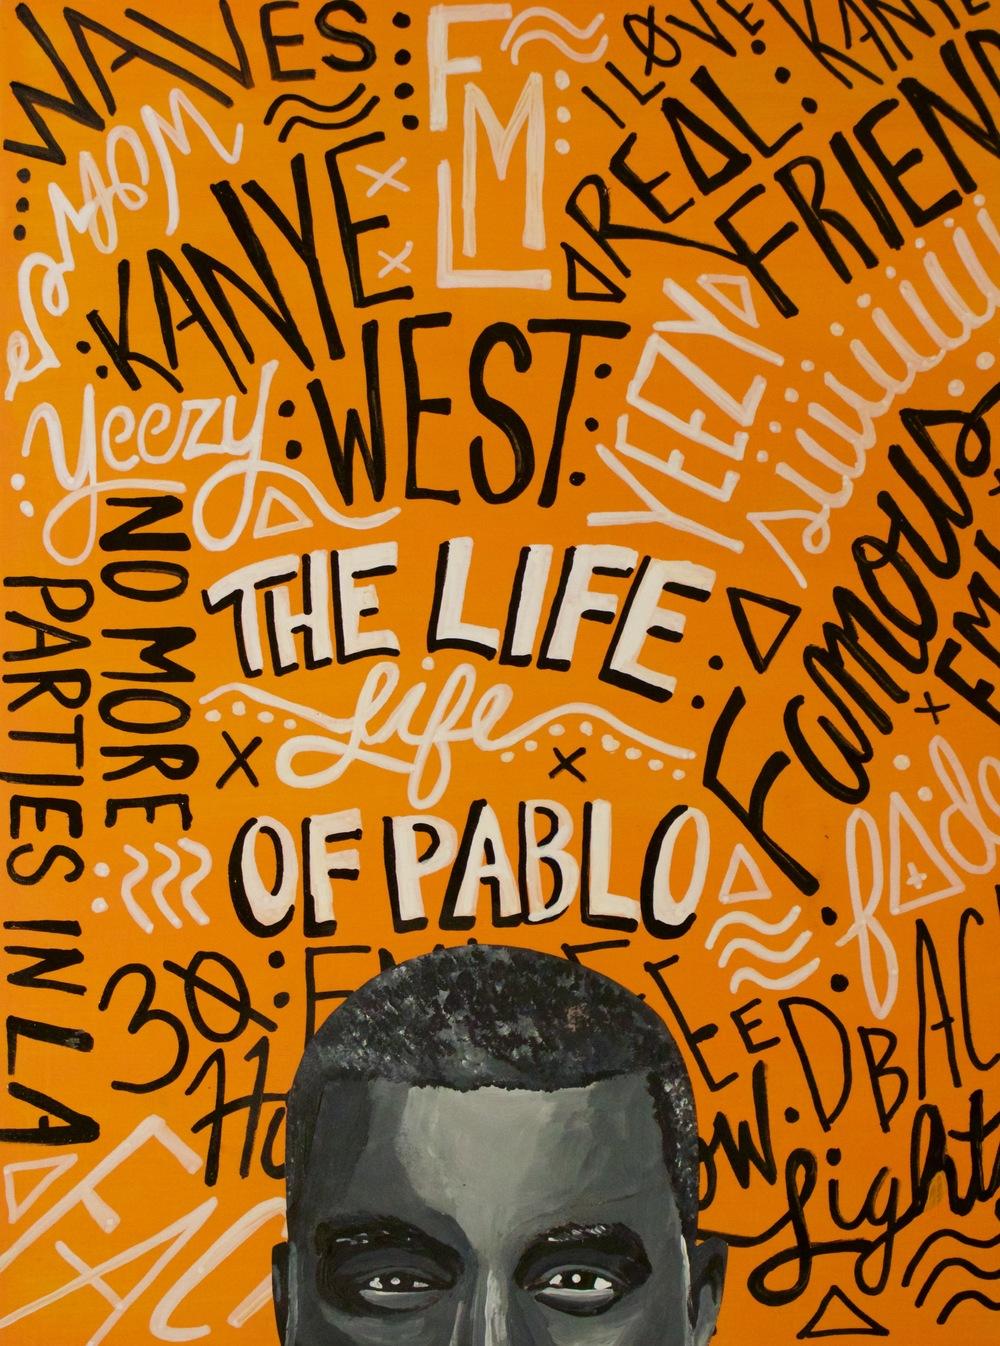 "Kanye West Typographic Portrait 16"" x 20"" (2016)"